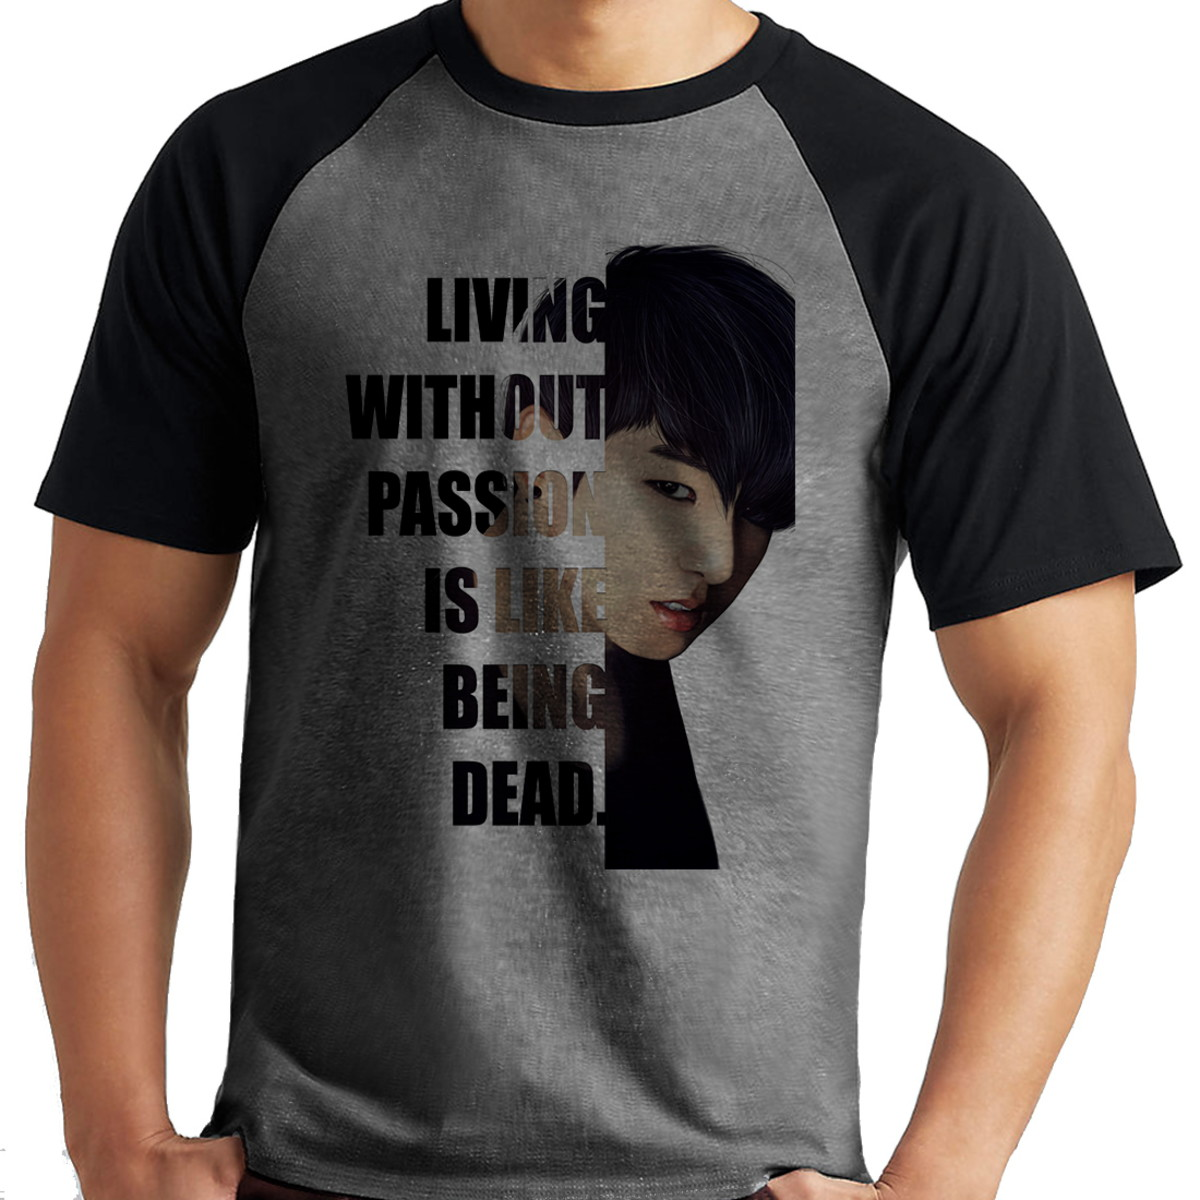 dc1fe8011 Camiseta BTS Jungkook Frases Raglan Mescla Manga Curta no Elo7 ...